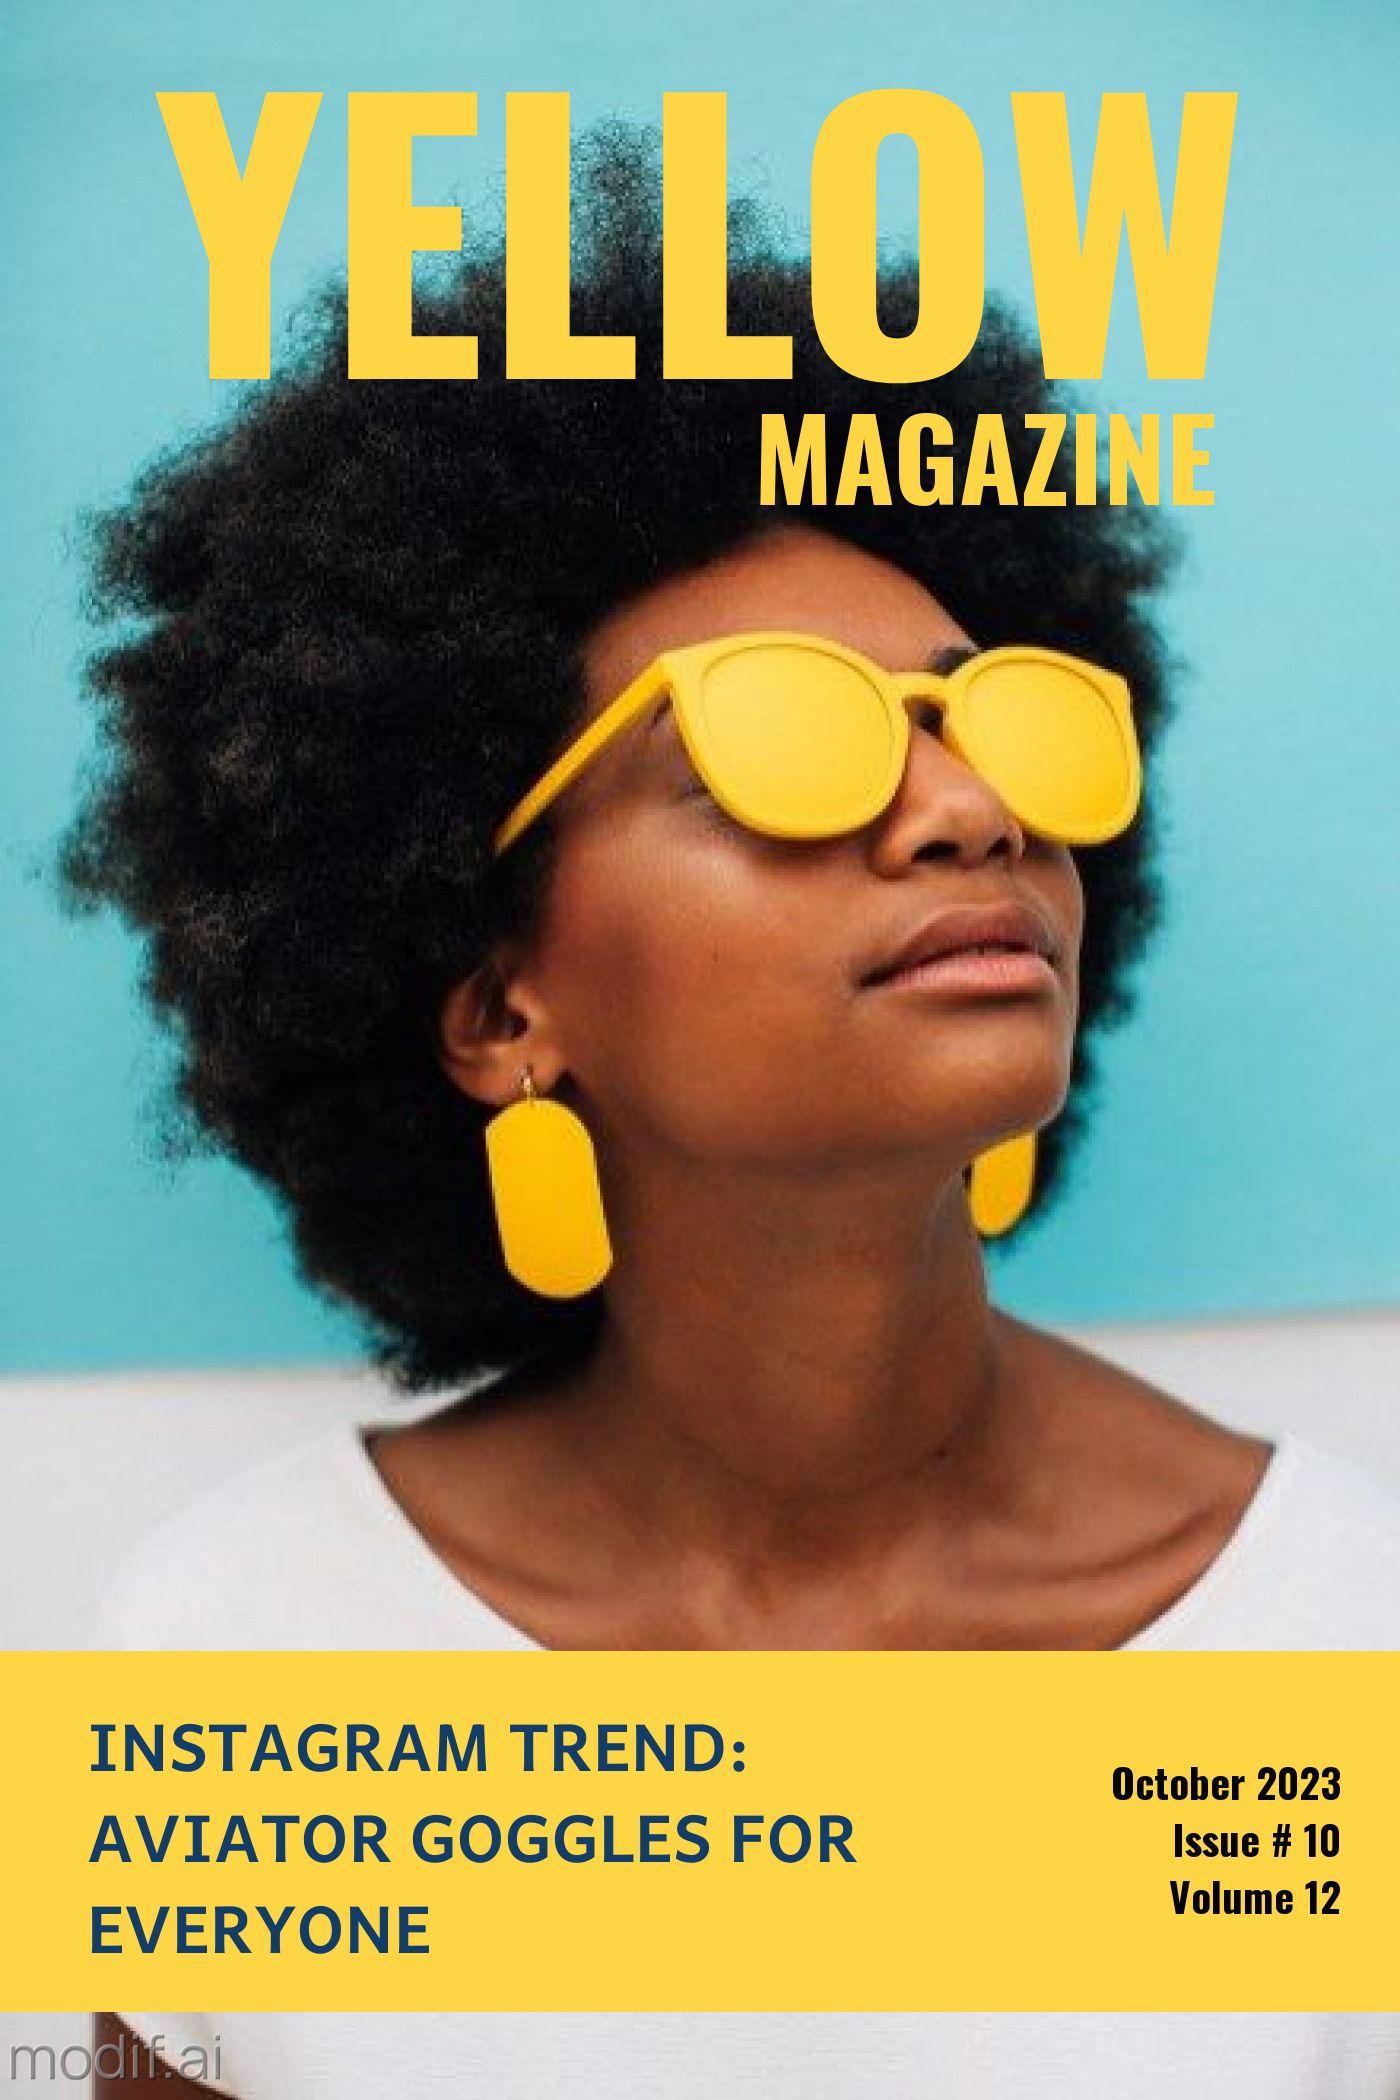 Yellow Magazine Cover Template Design